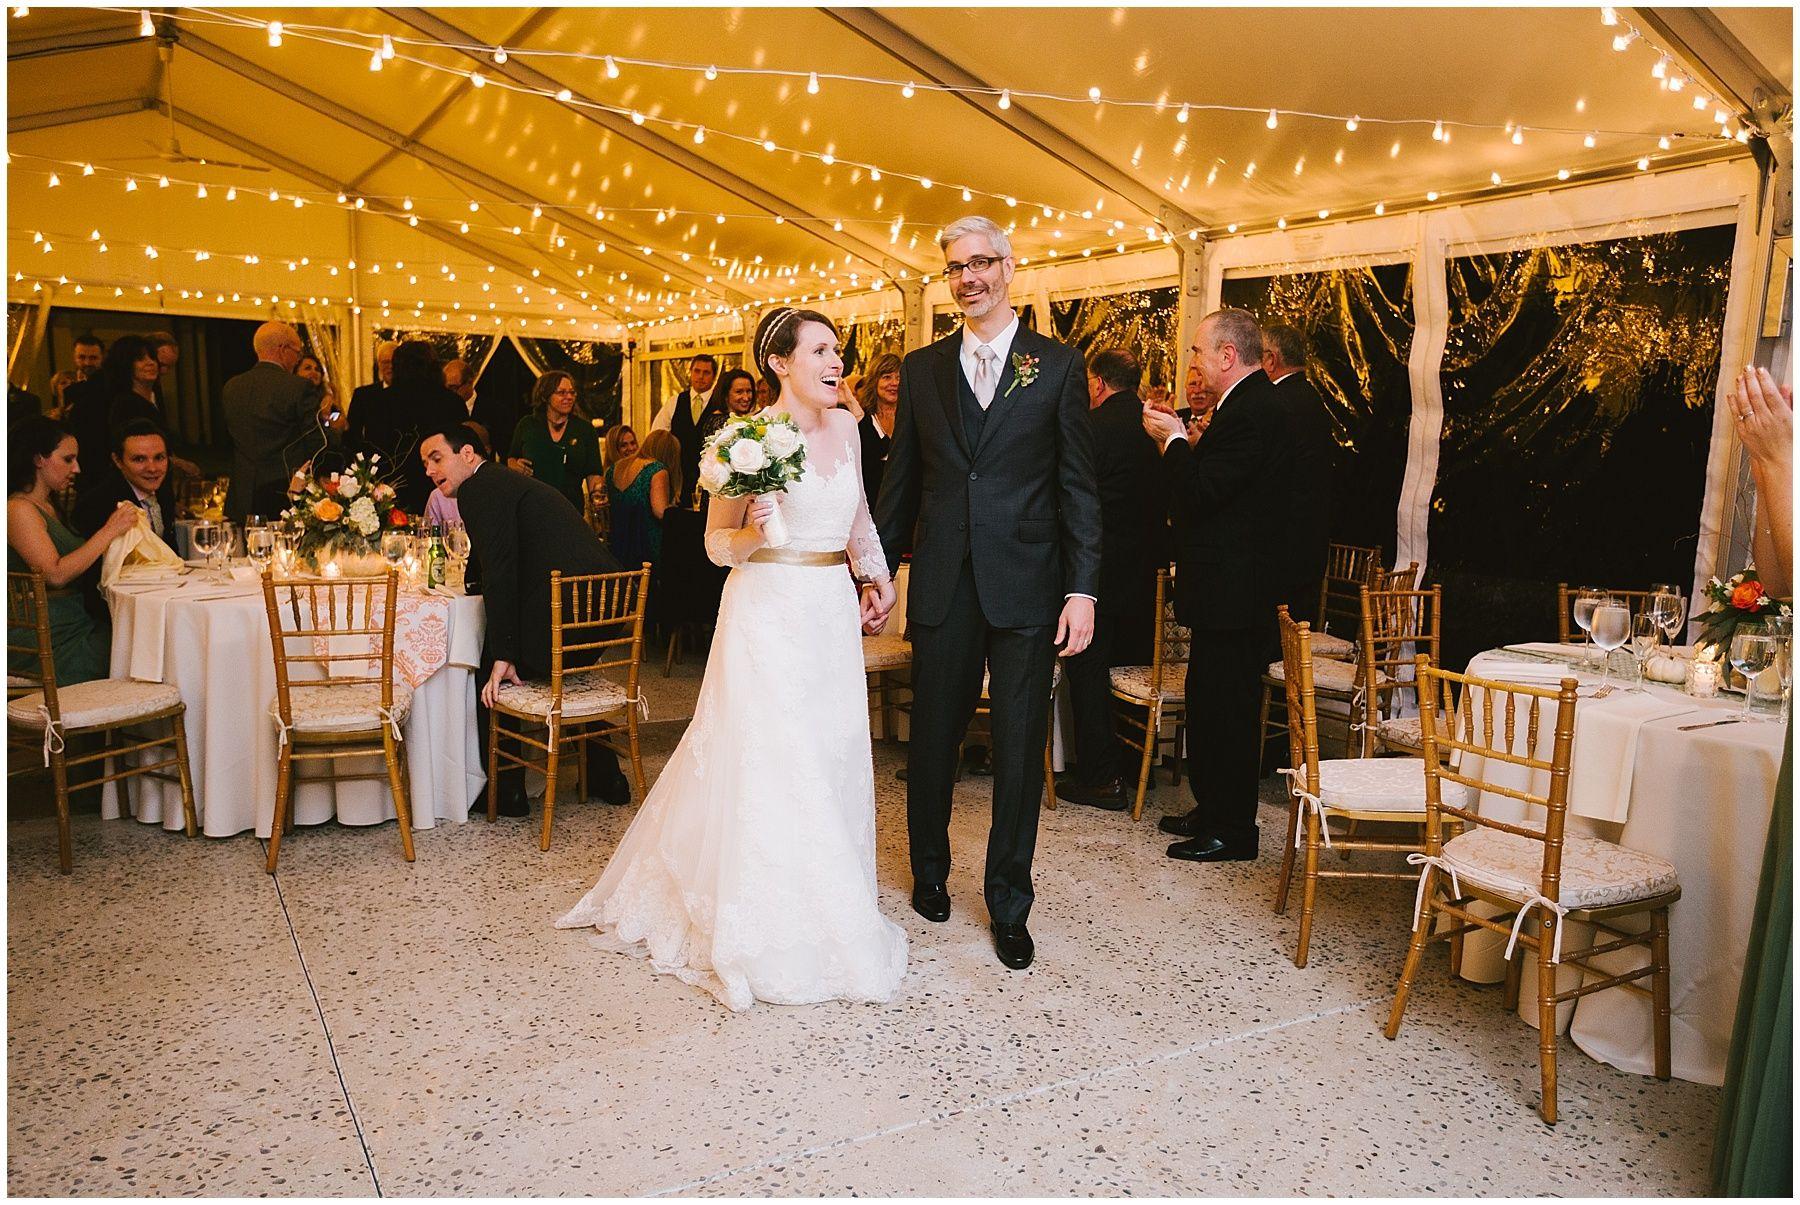 Lindaeric wedding at american swedish museum philadelphia dream